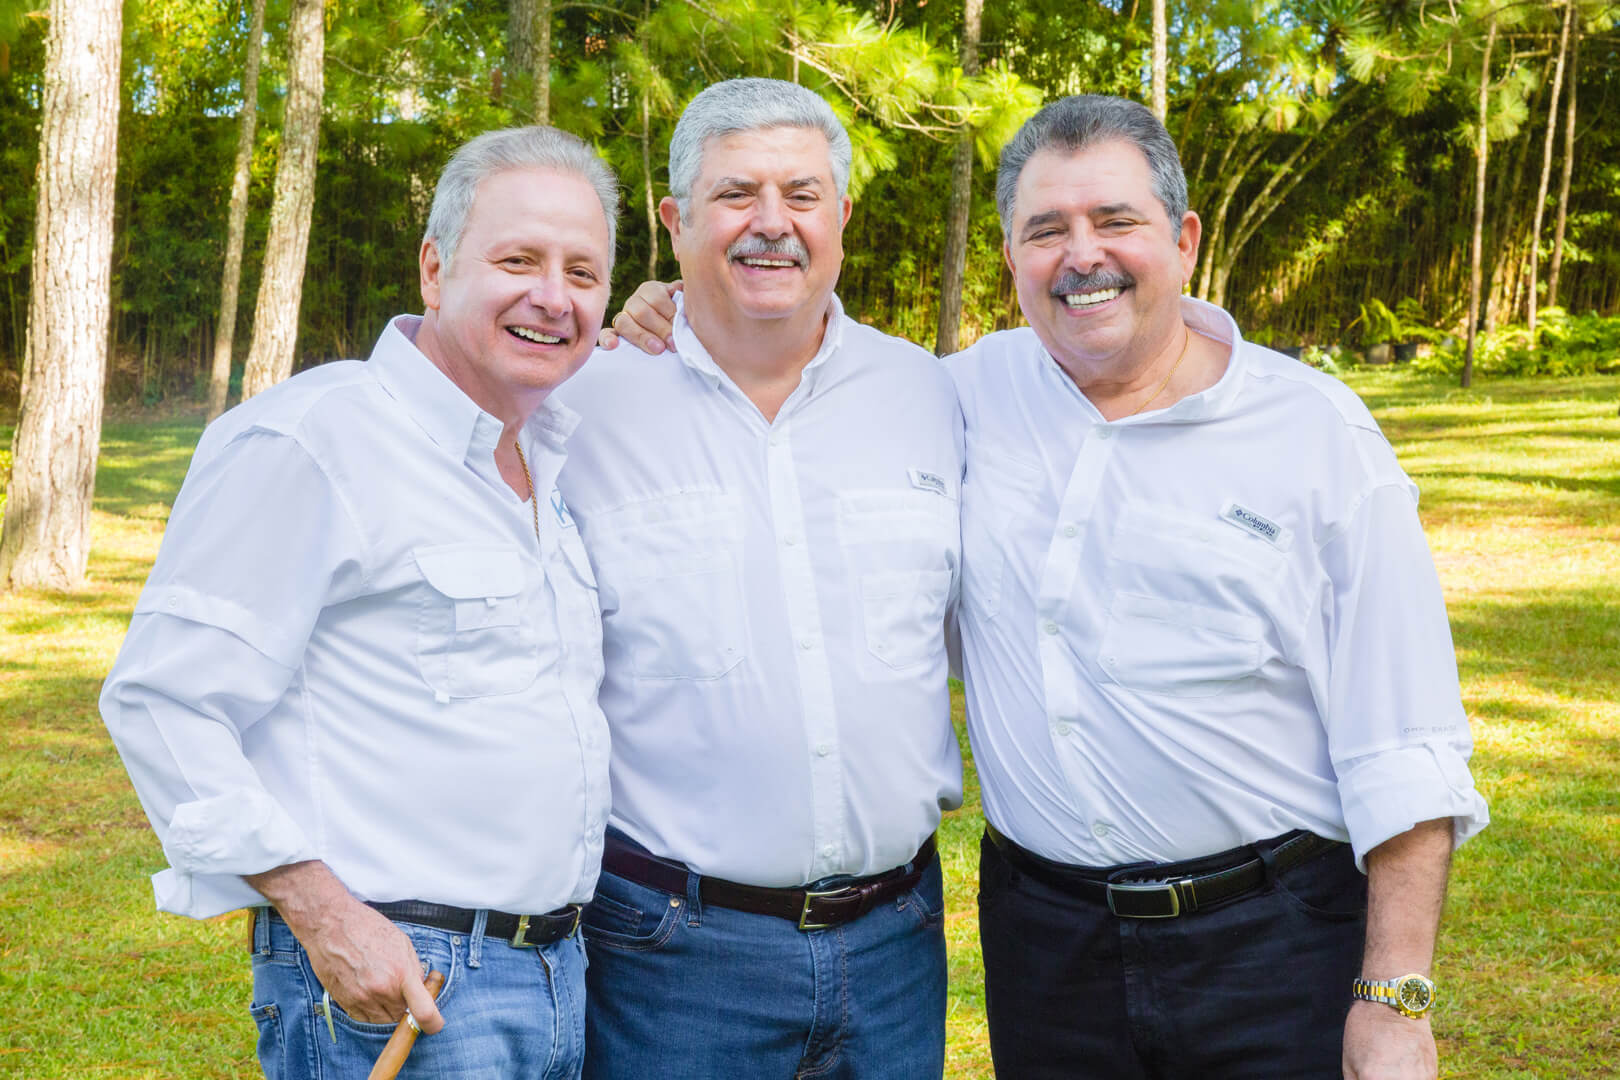 Luis, Eduardo y Schucry kafie | Fundación Kafie